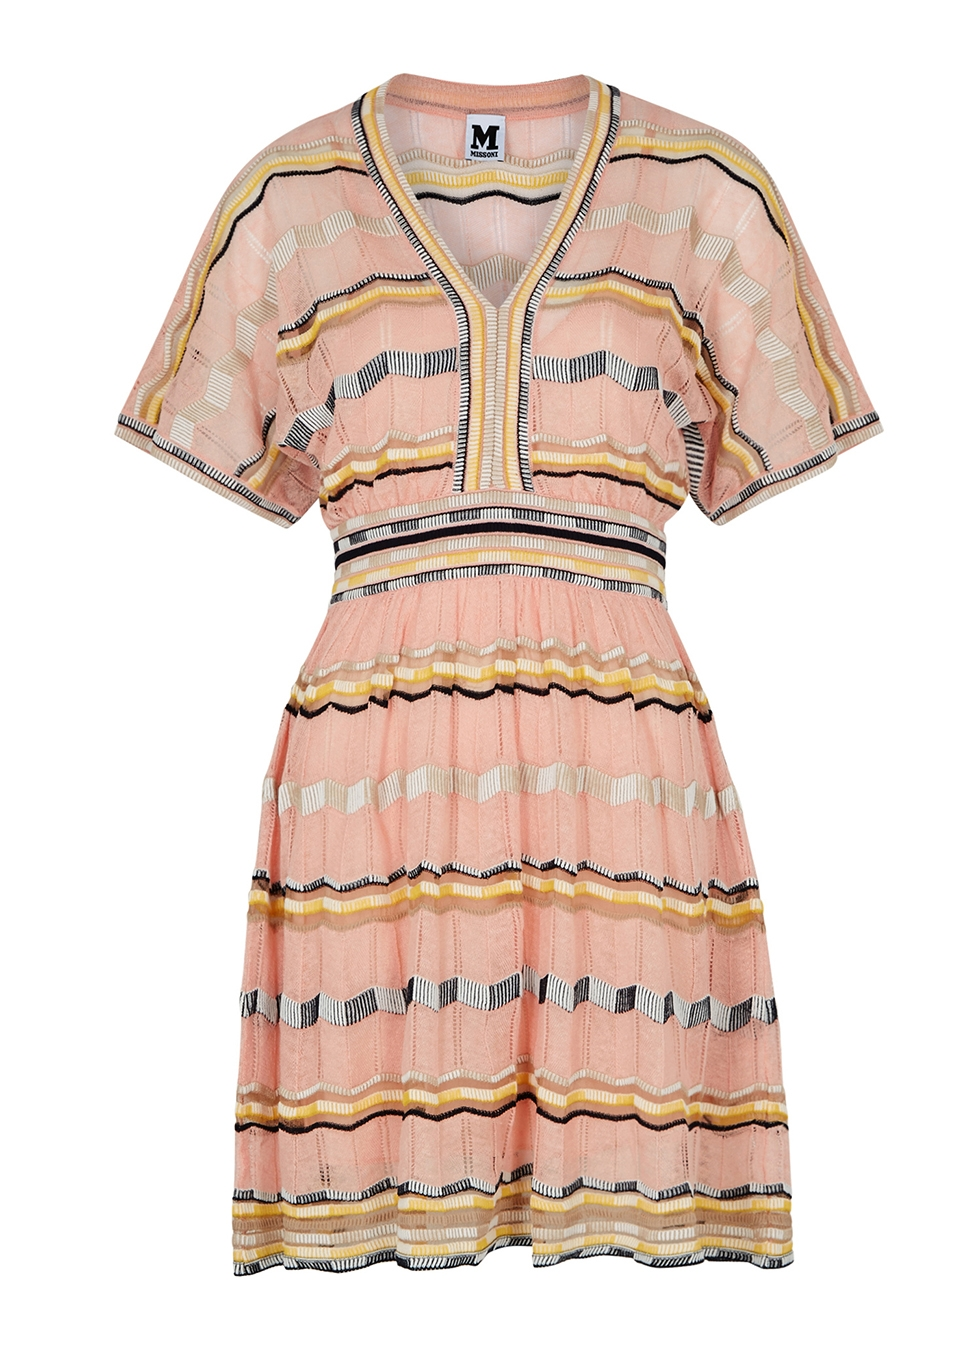 Light pink stretch-knit cotton-blend dress - M Missoni